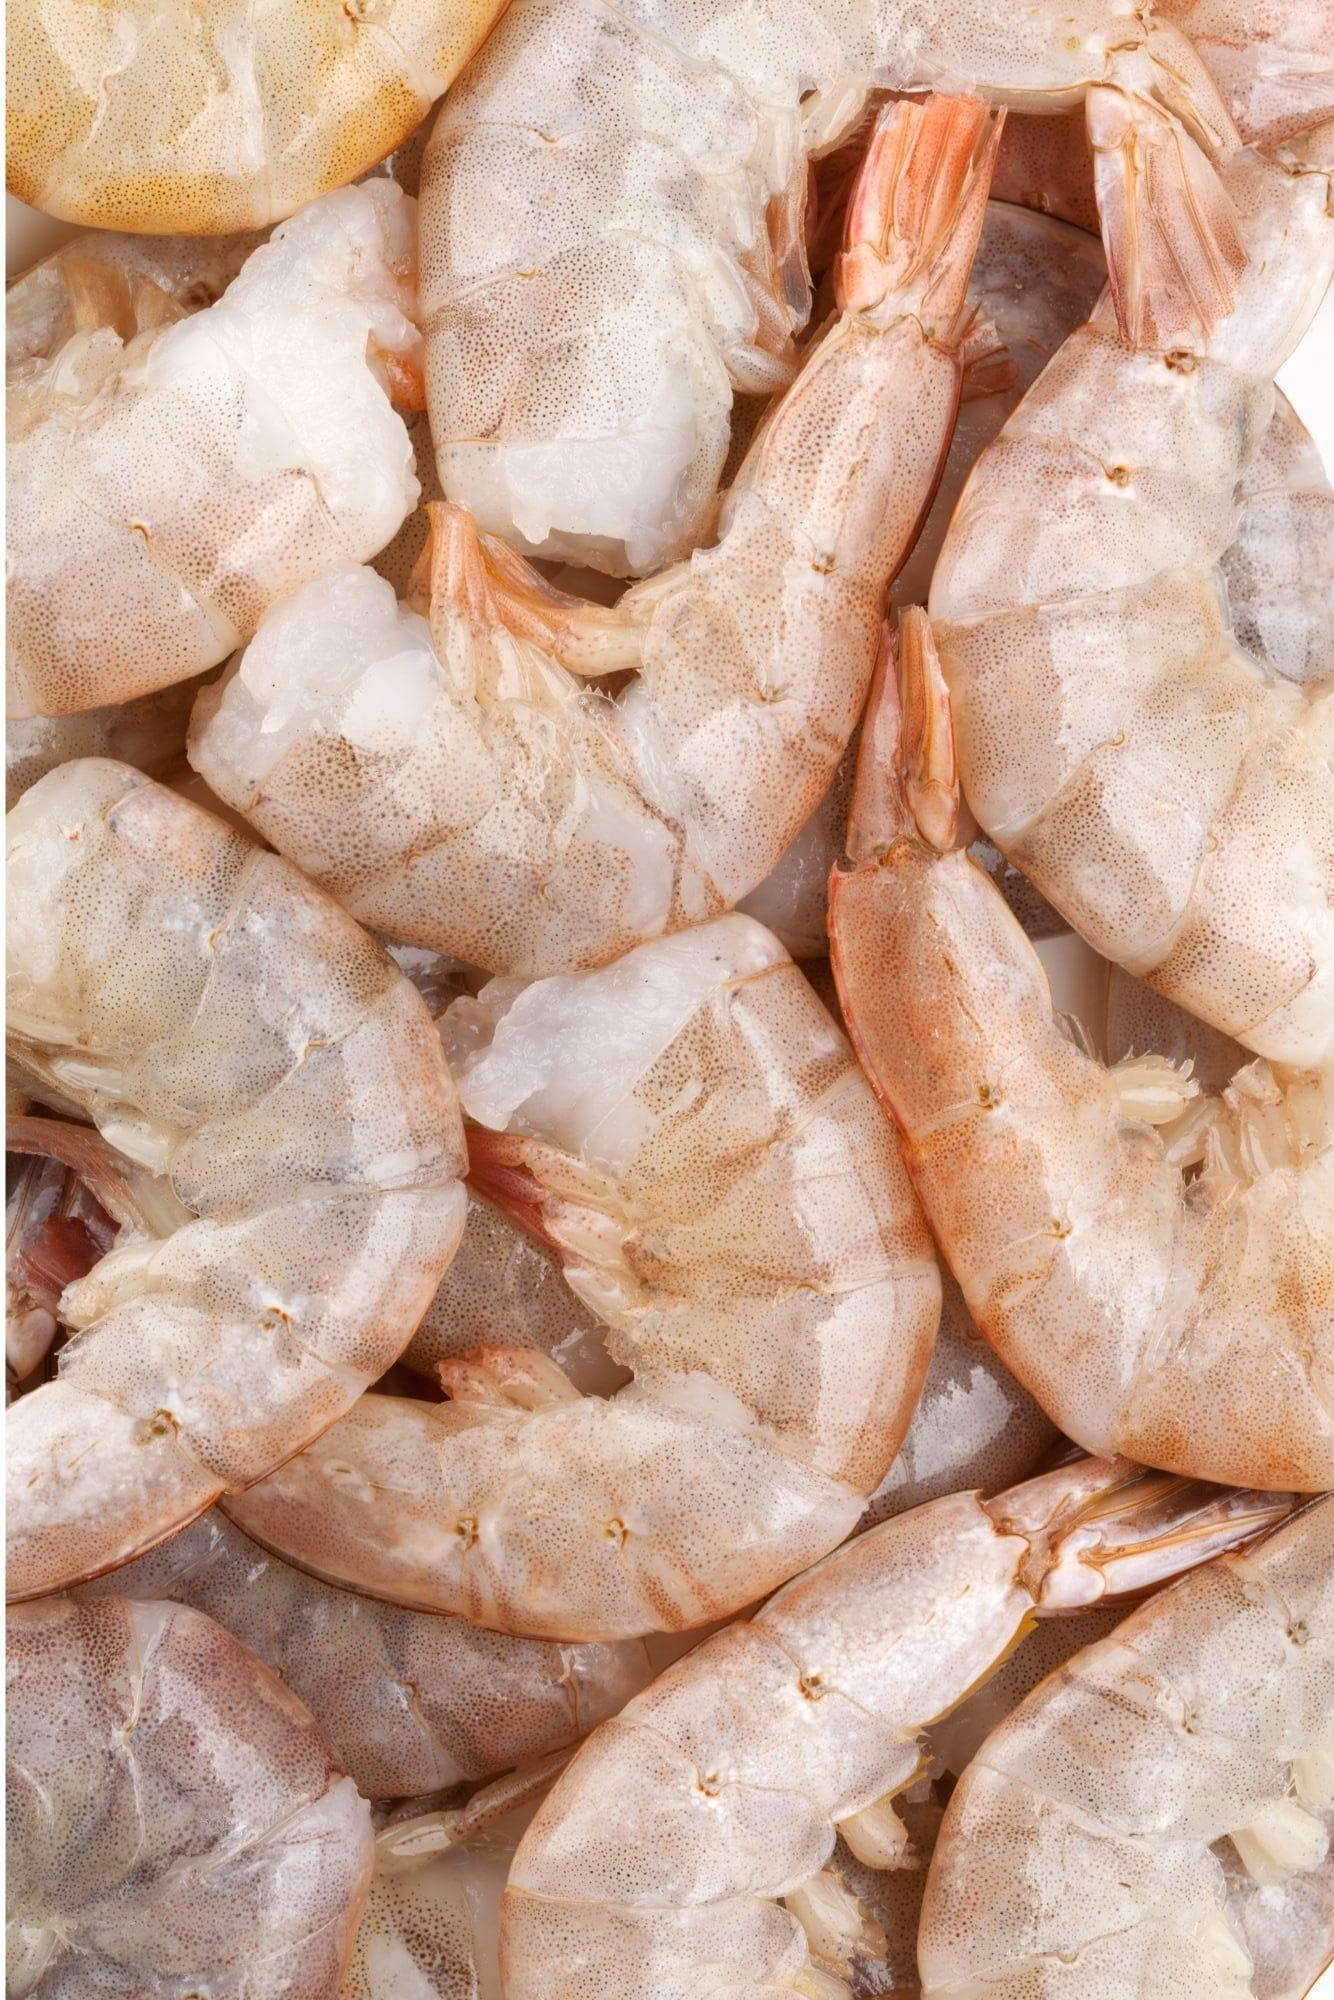 uncooked shrimp in shells